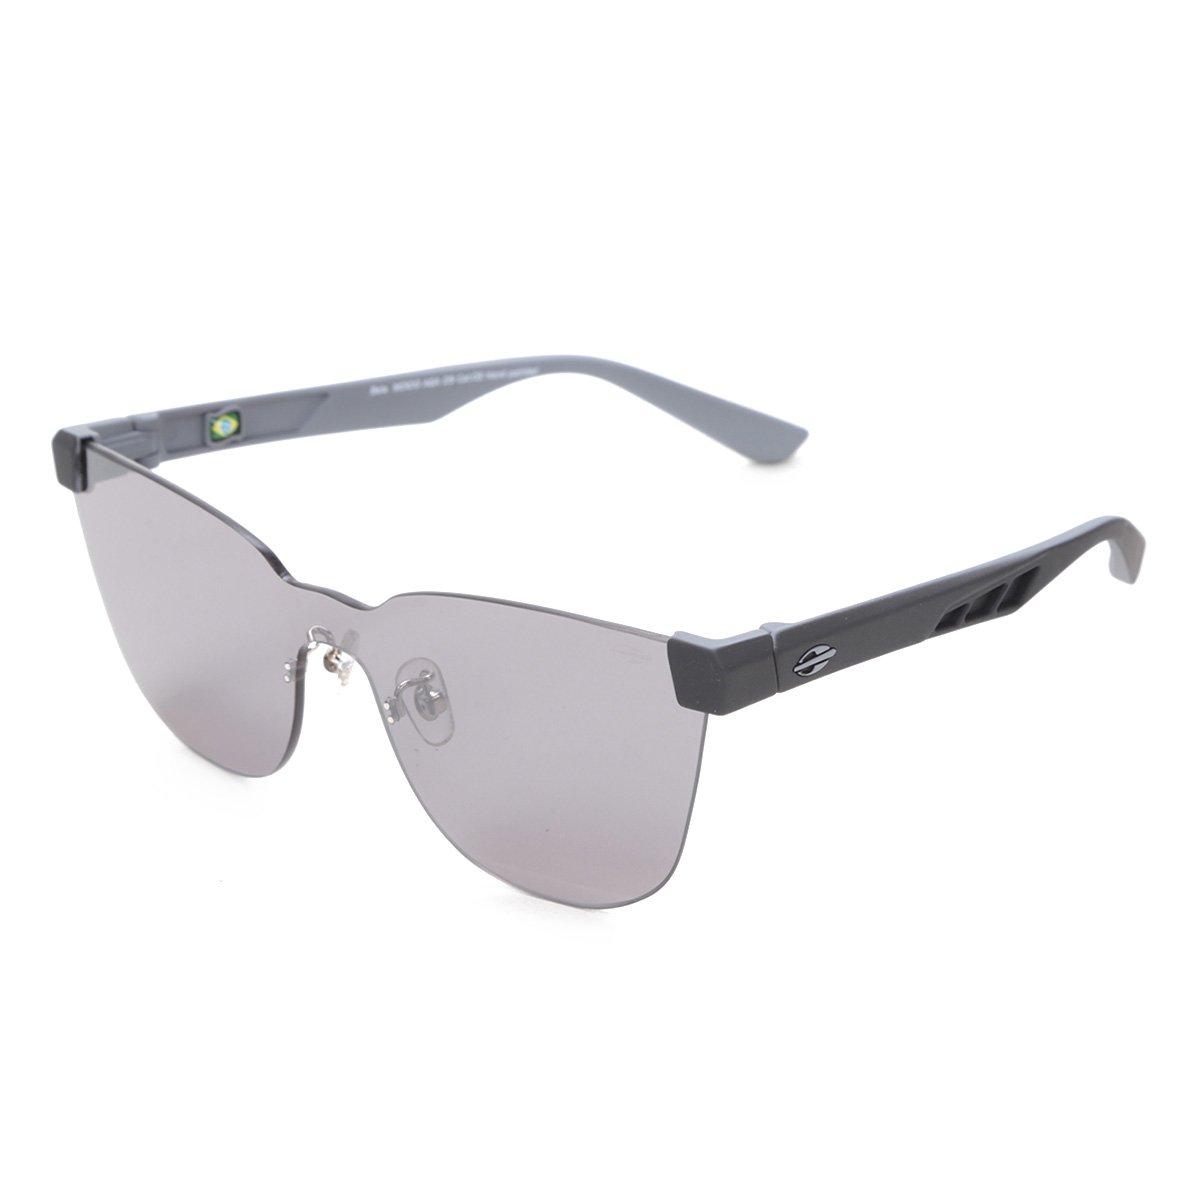 Óculos de Sol Mormaii Bela M0100AGA09 Feminino